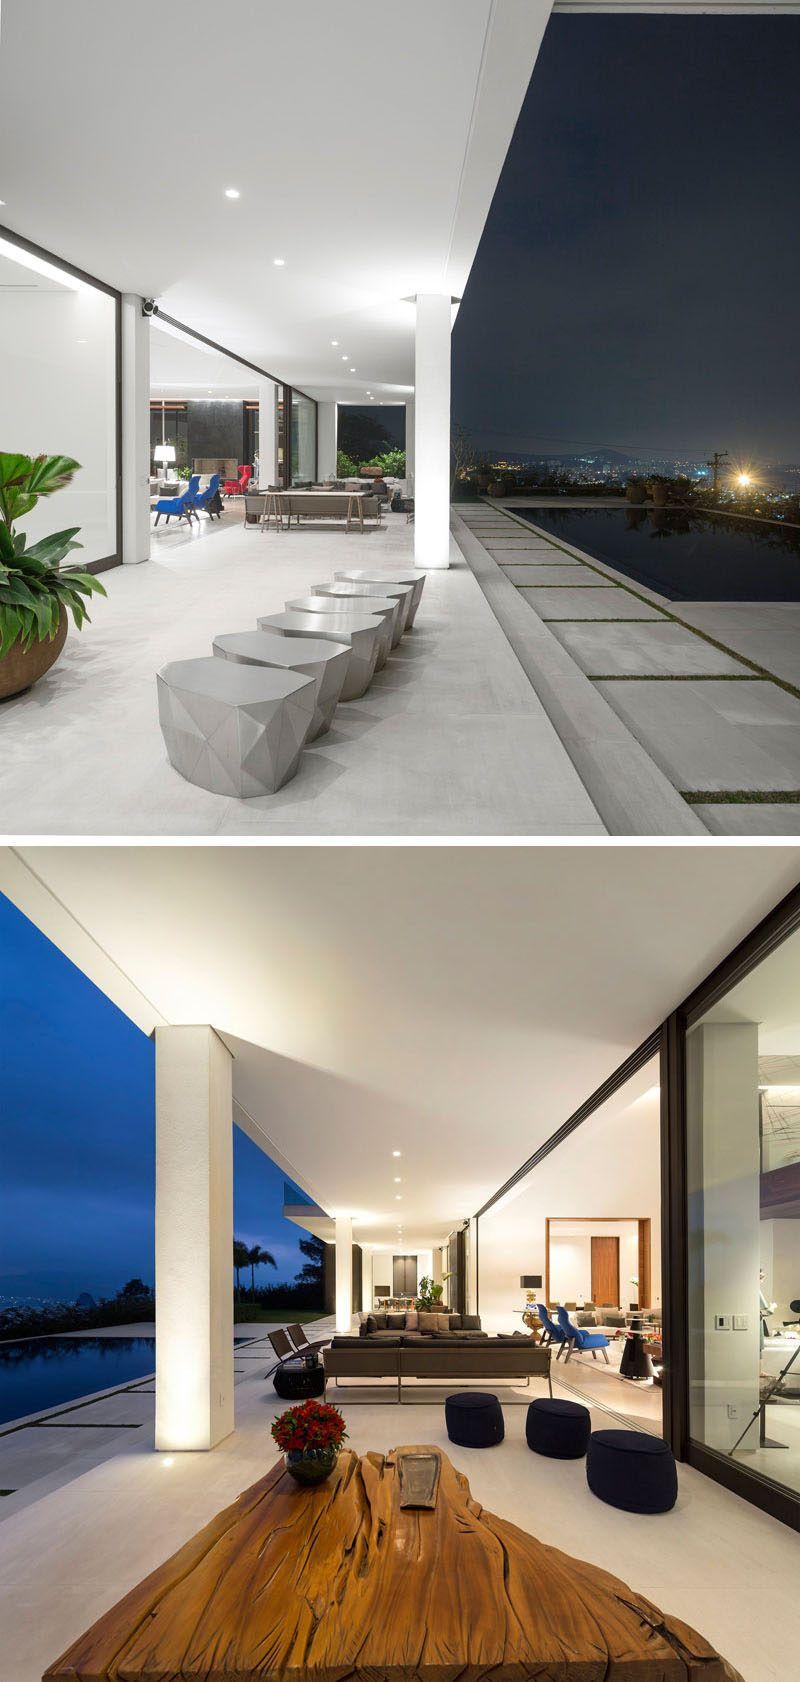 House Home in Alphaville designed by